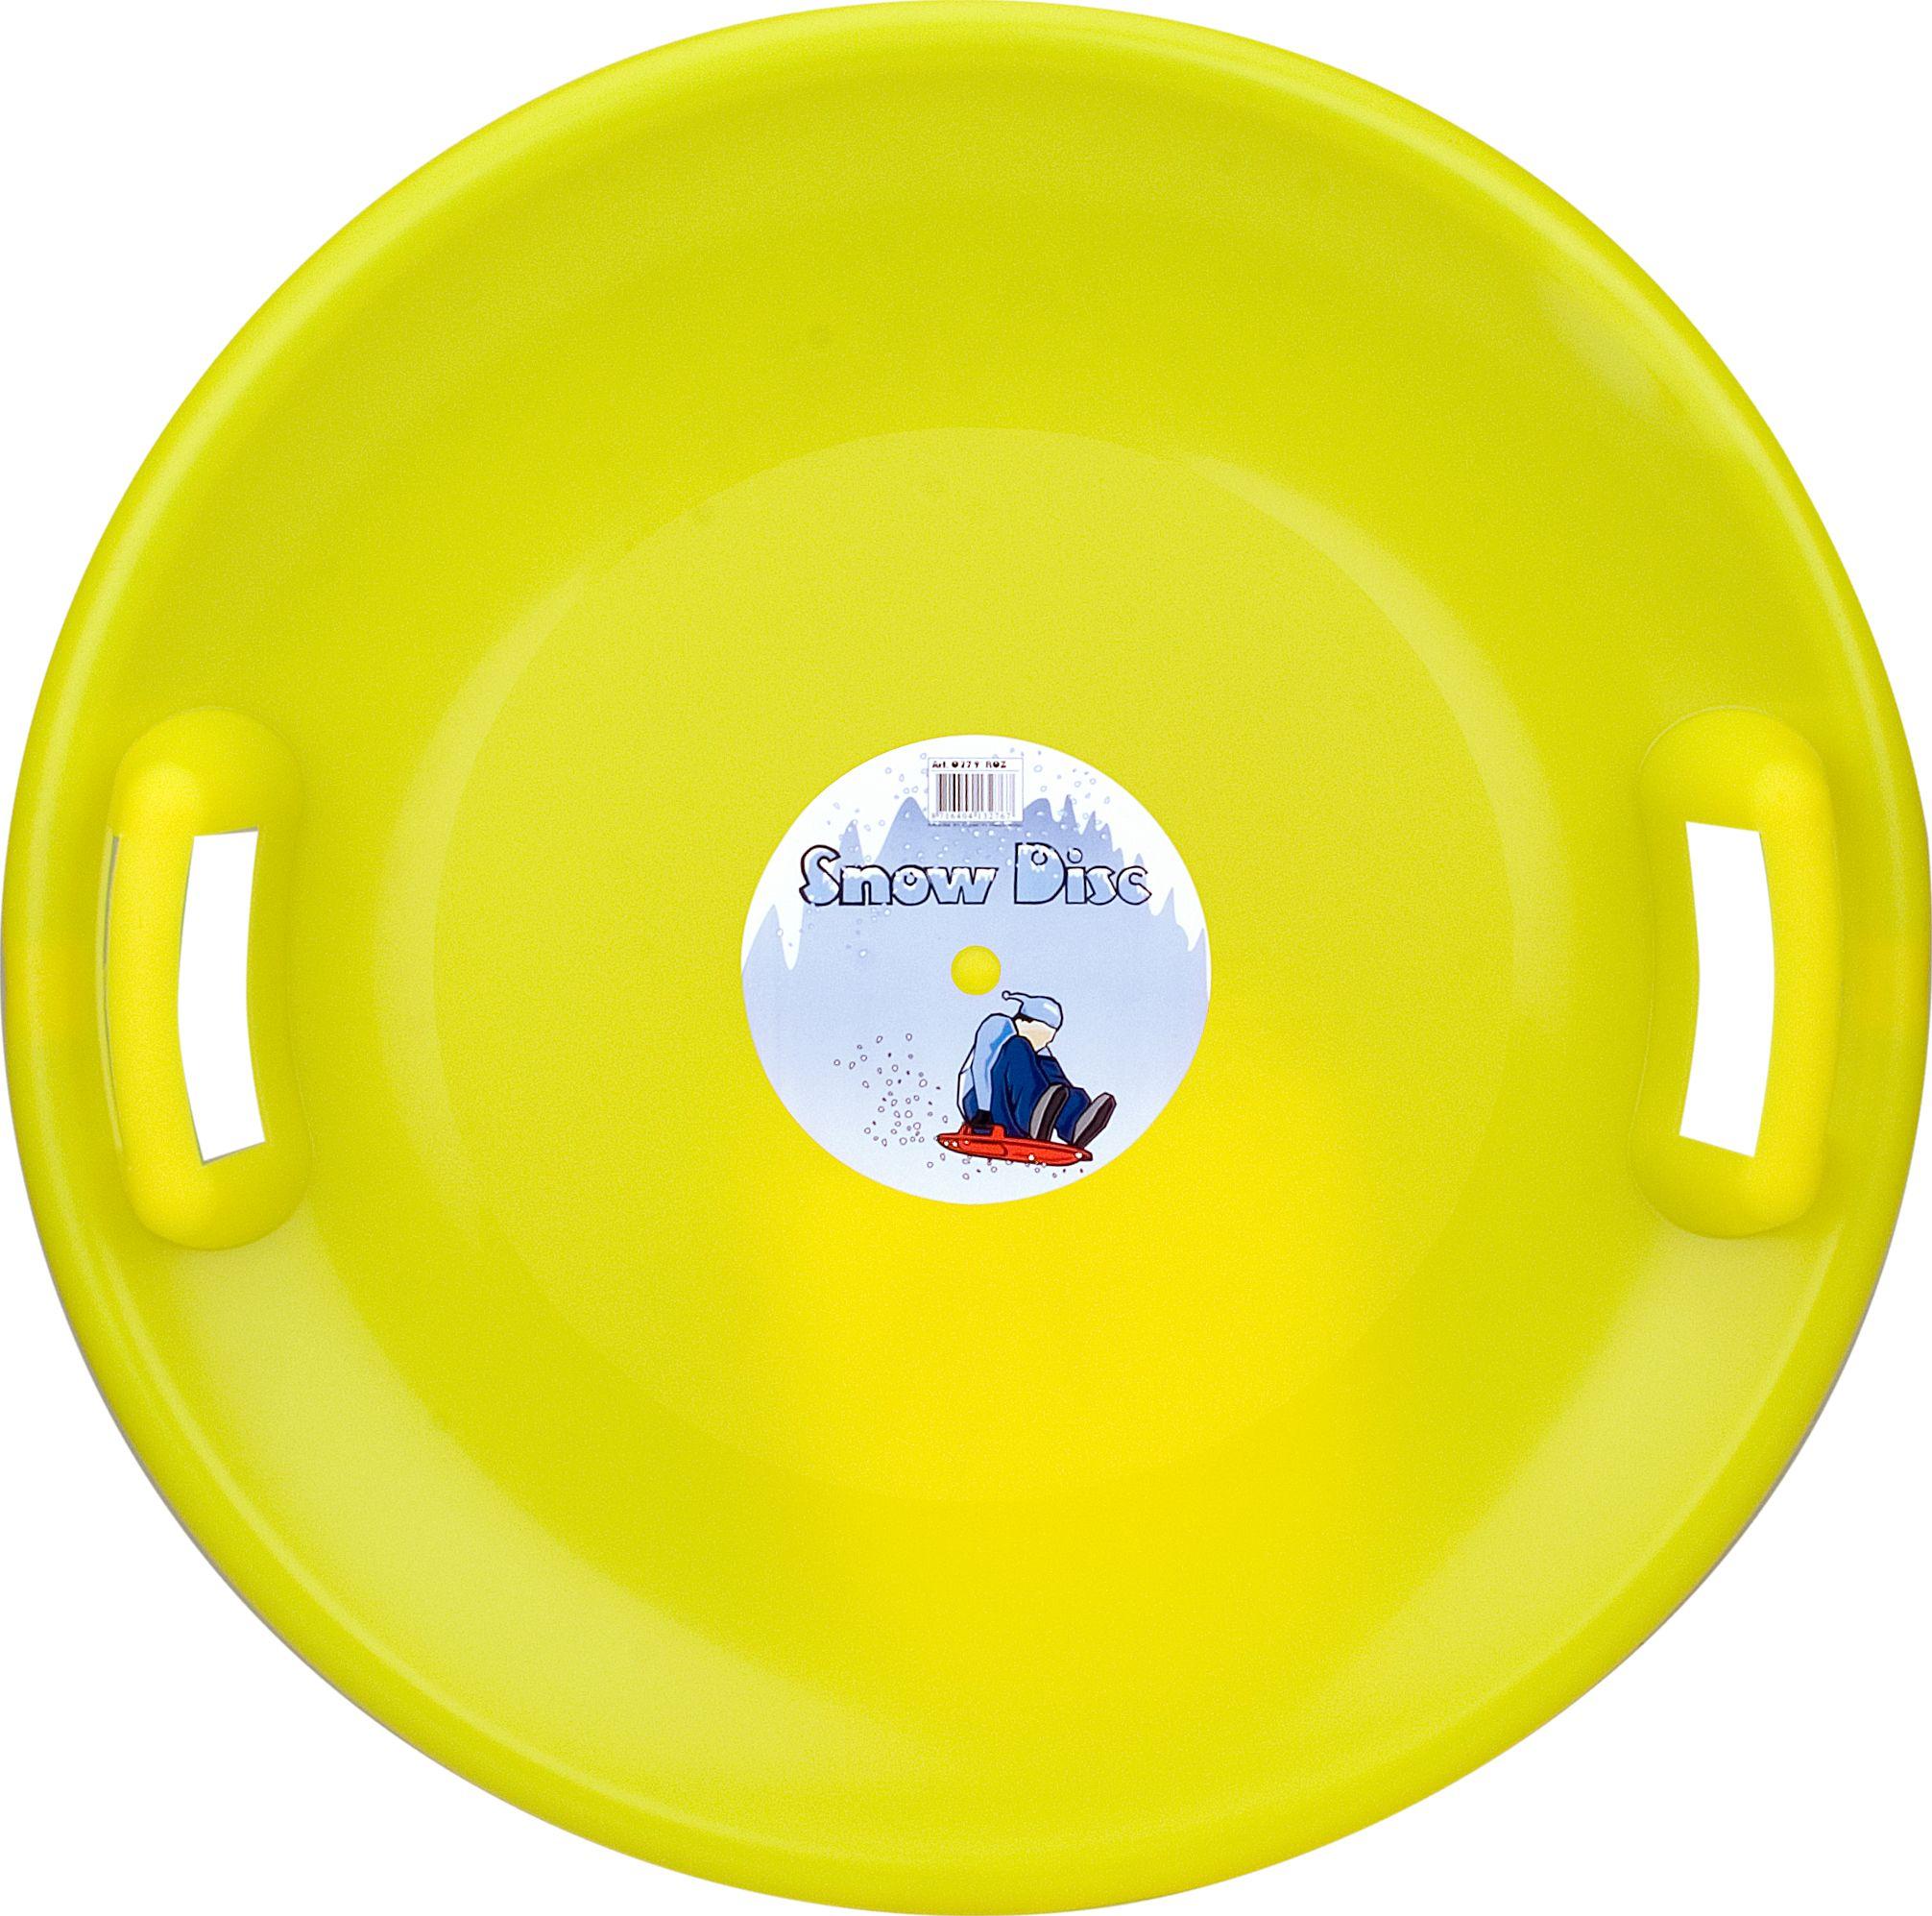 Slede Glijschotel • Snow Disc •